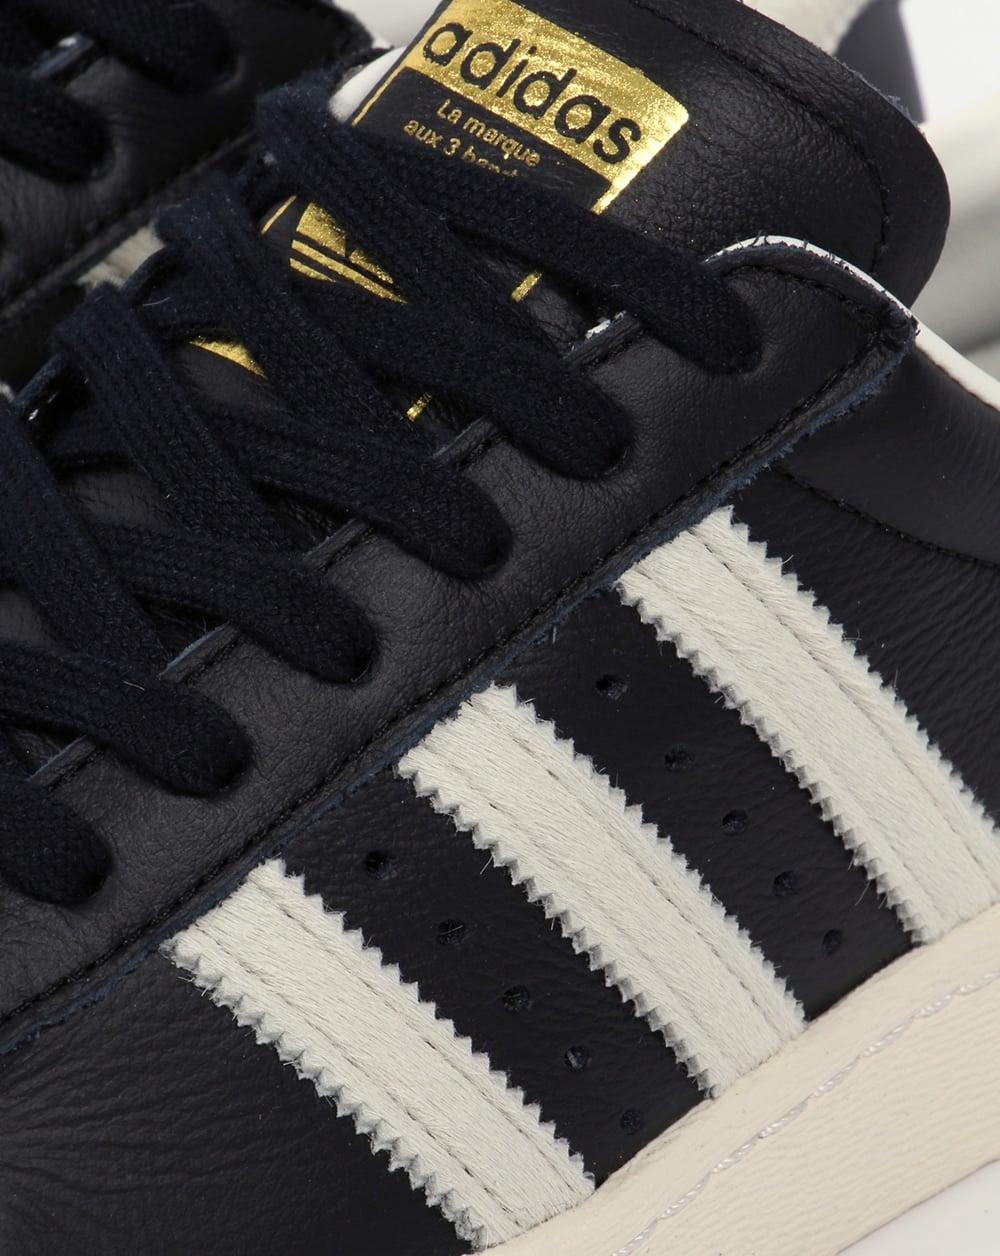 Adidas Superstar 80s Sort Og Gull LjZmaQS